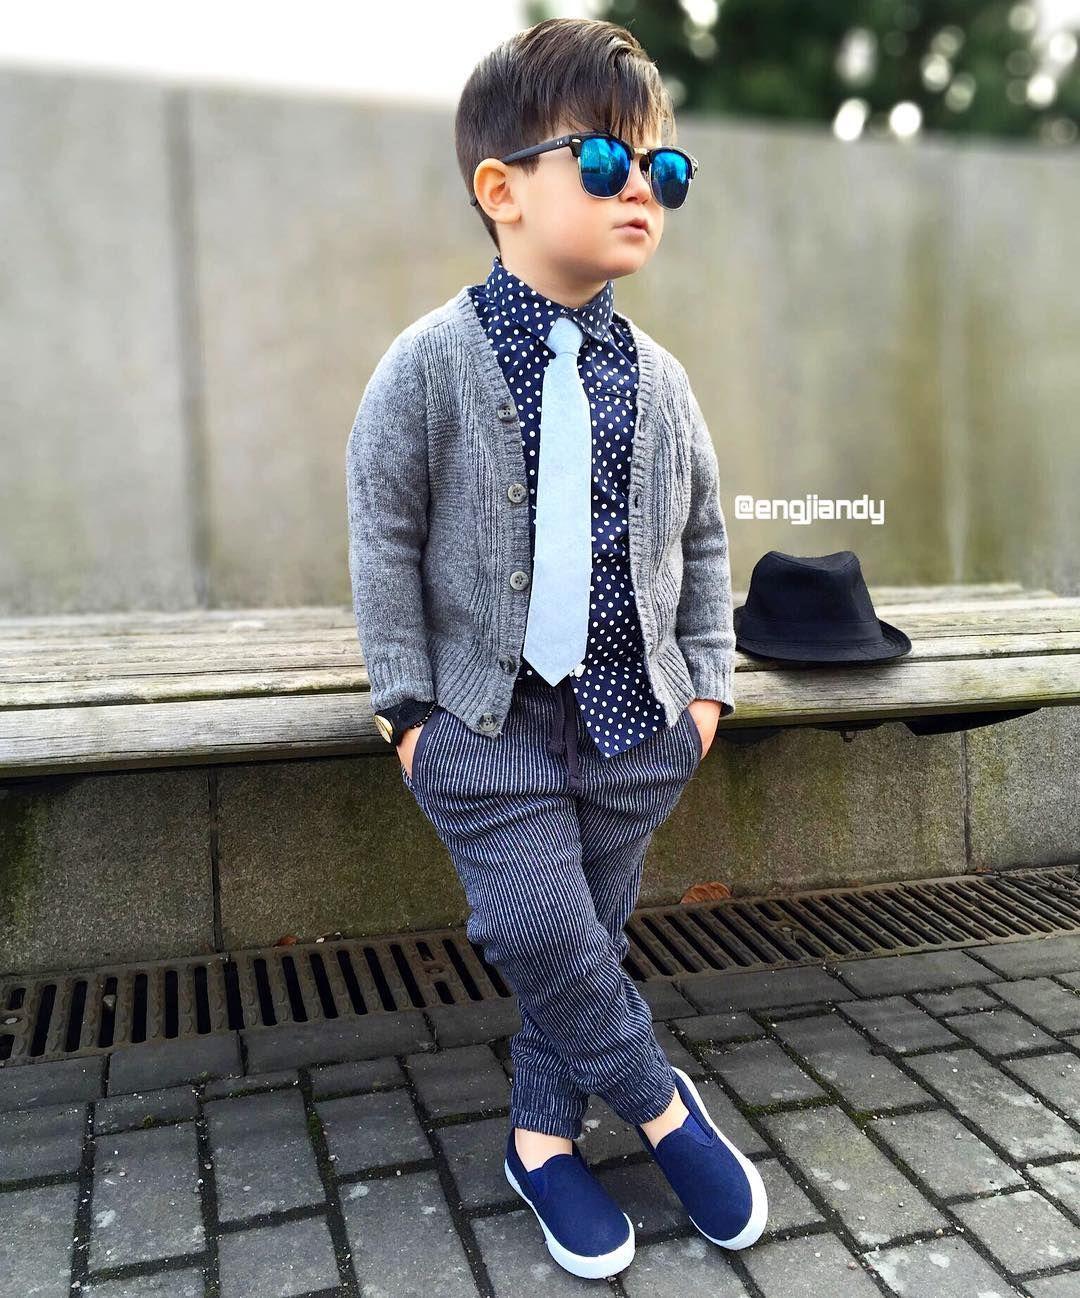 Engjiandy Moda Infantil Masculina Moda Infantil Para